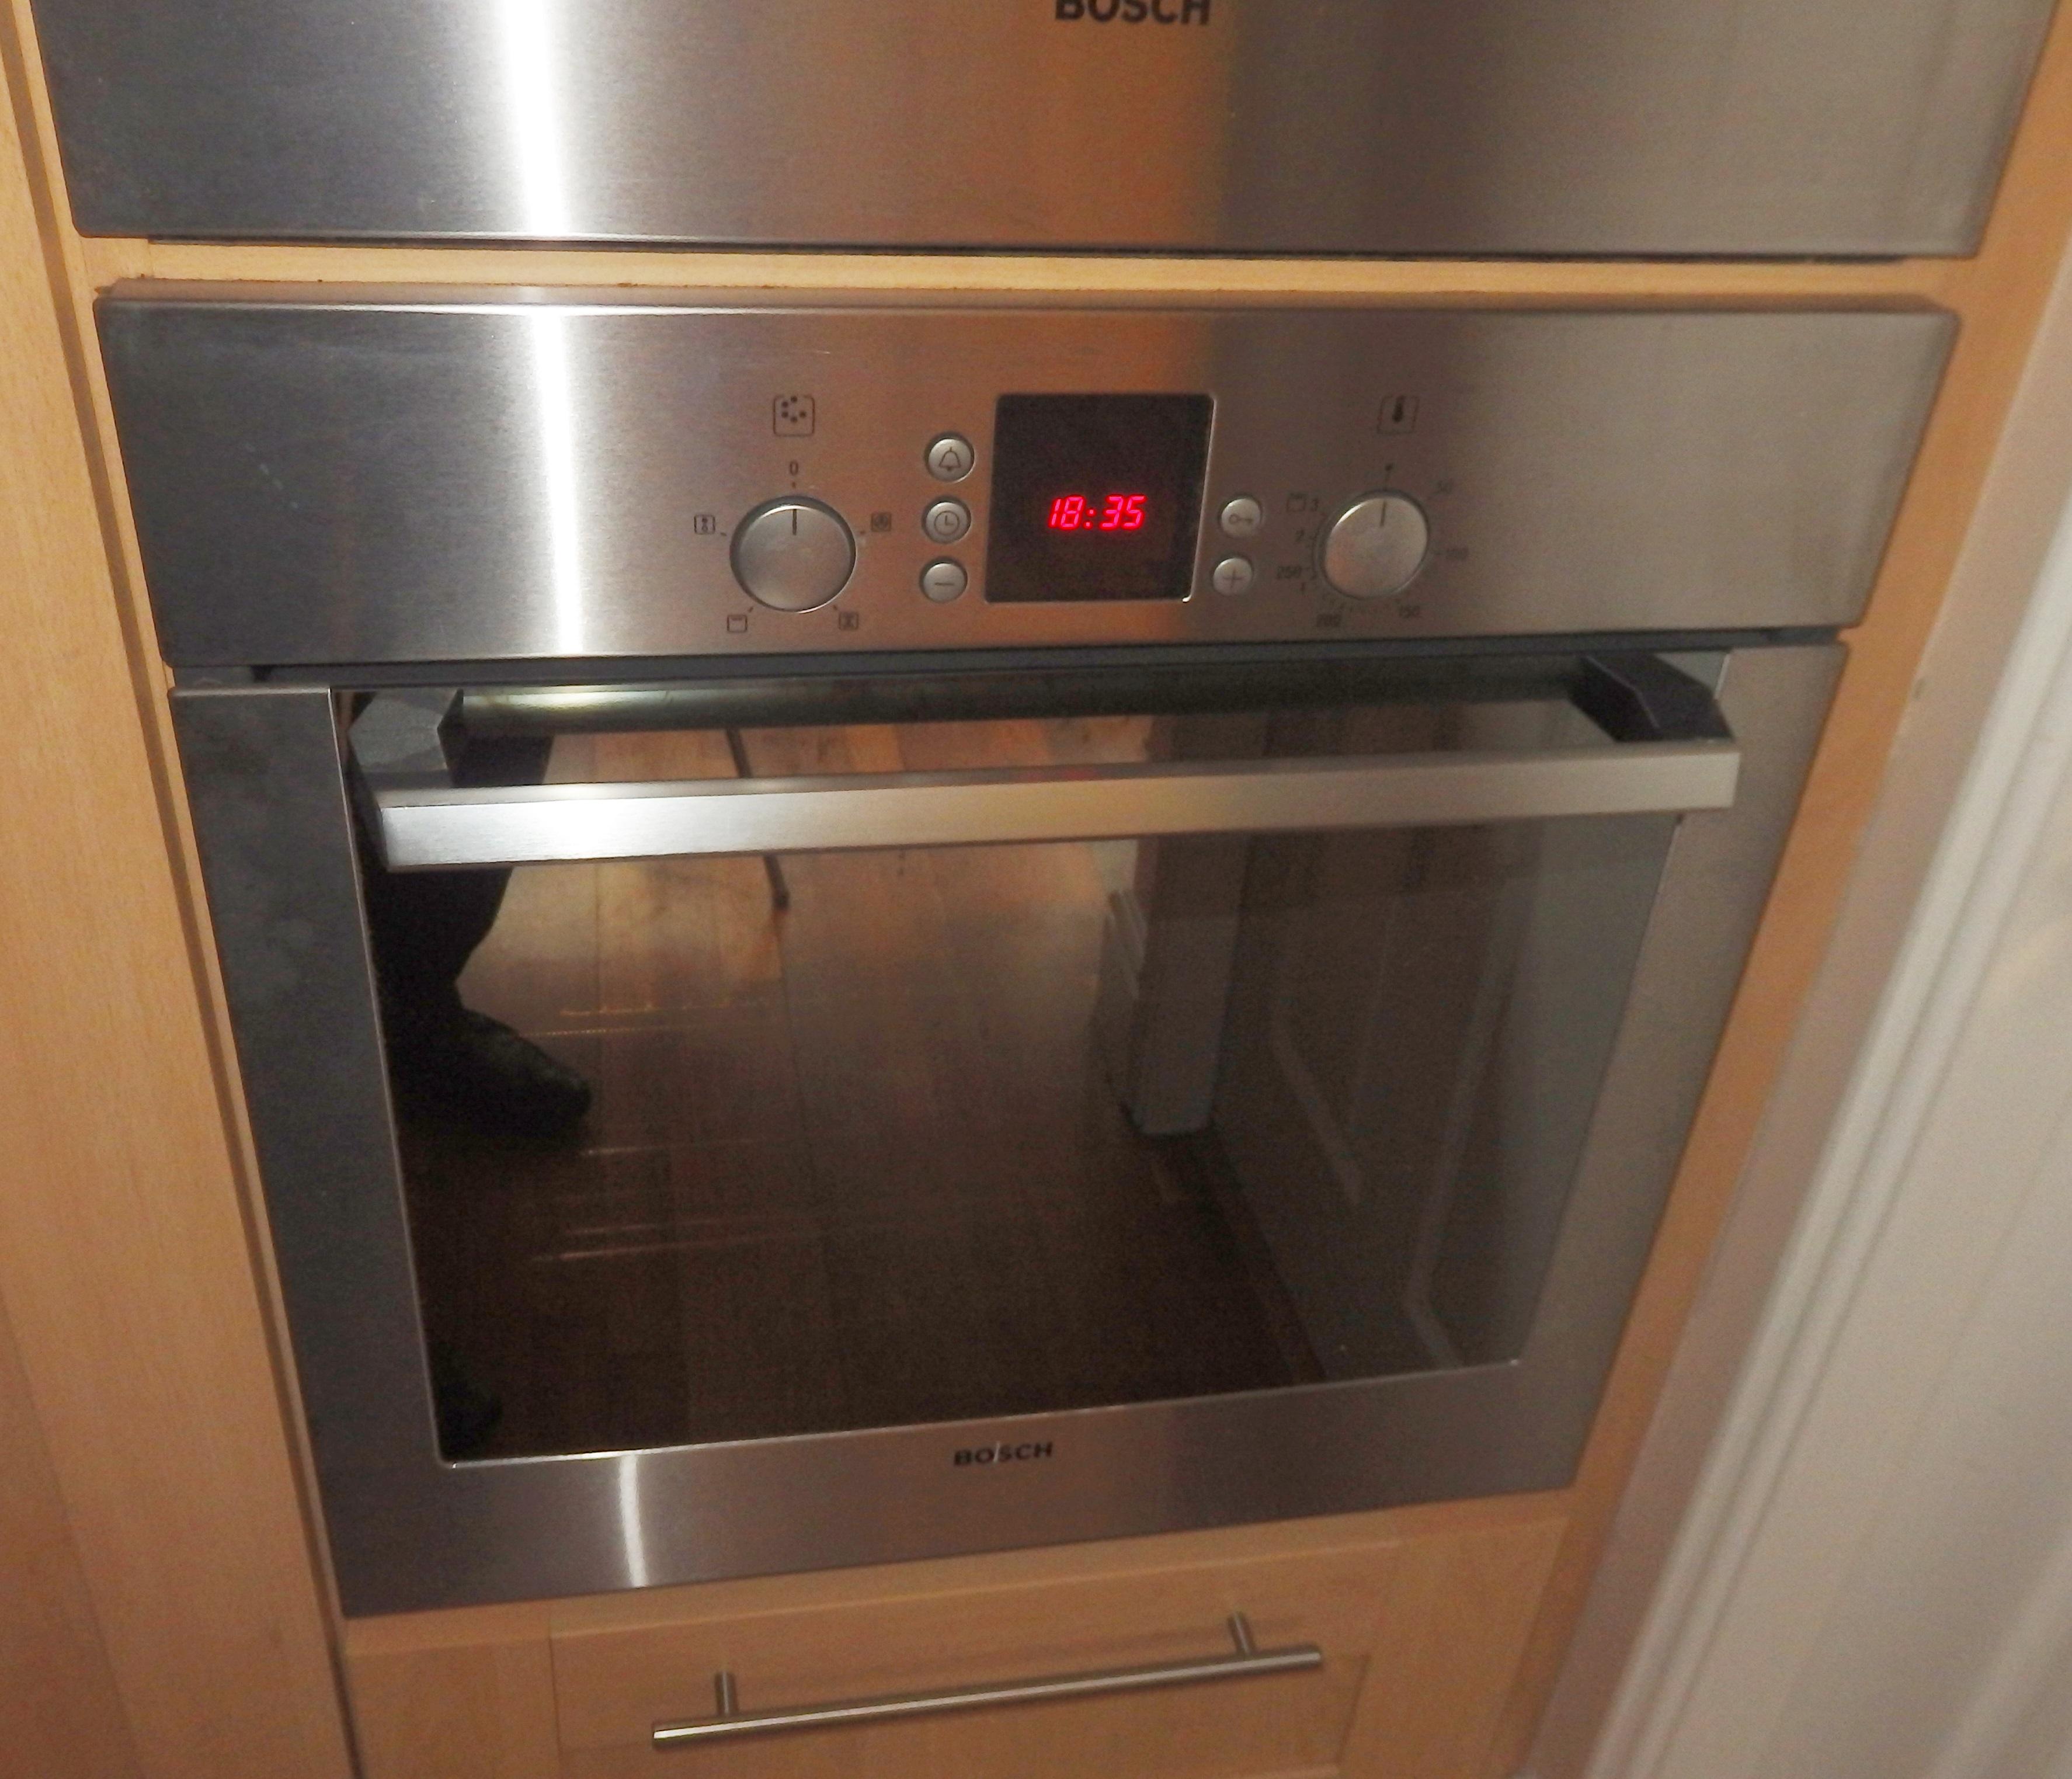 Oak Shaker Style Kitchen With Appliances Timeless Shaker Style Design Selection Of Bosch Appl